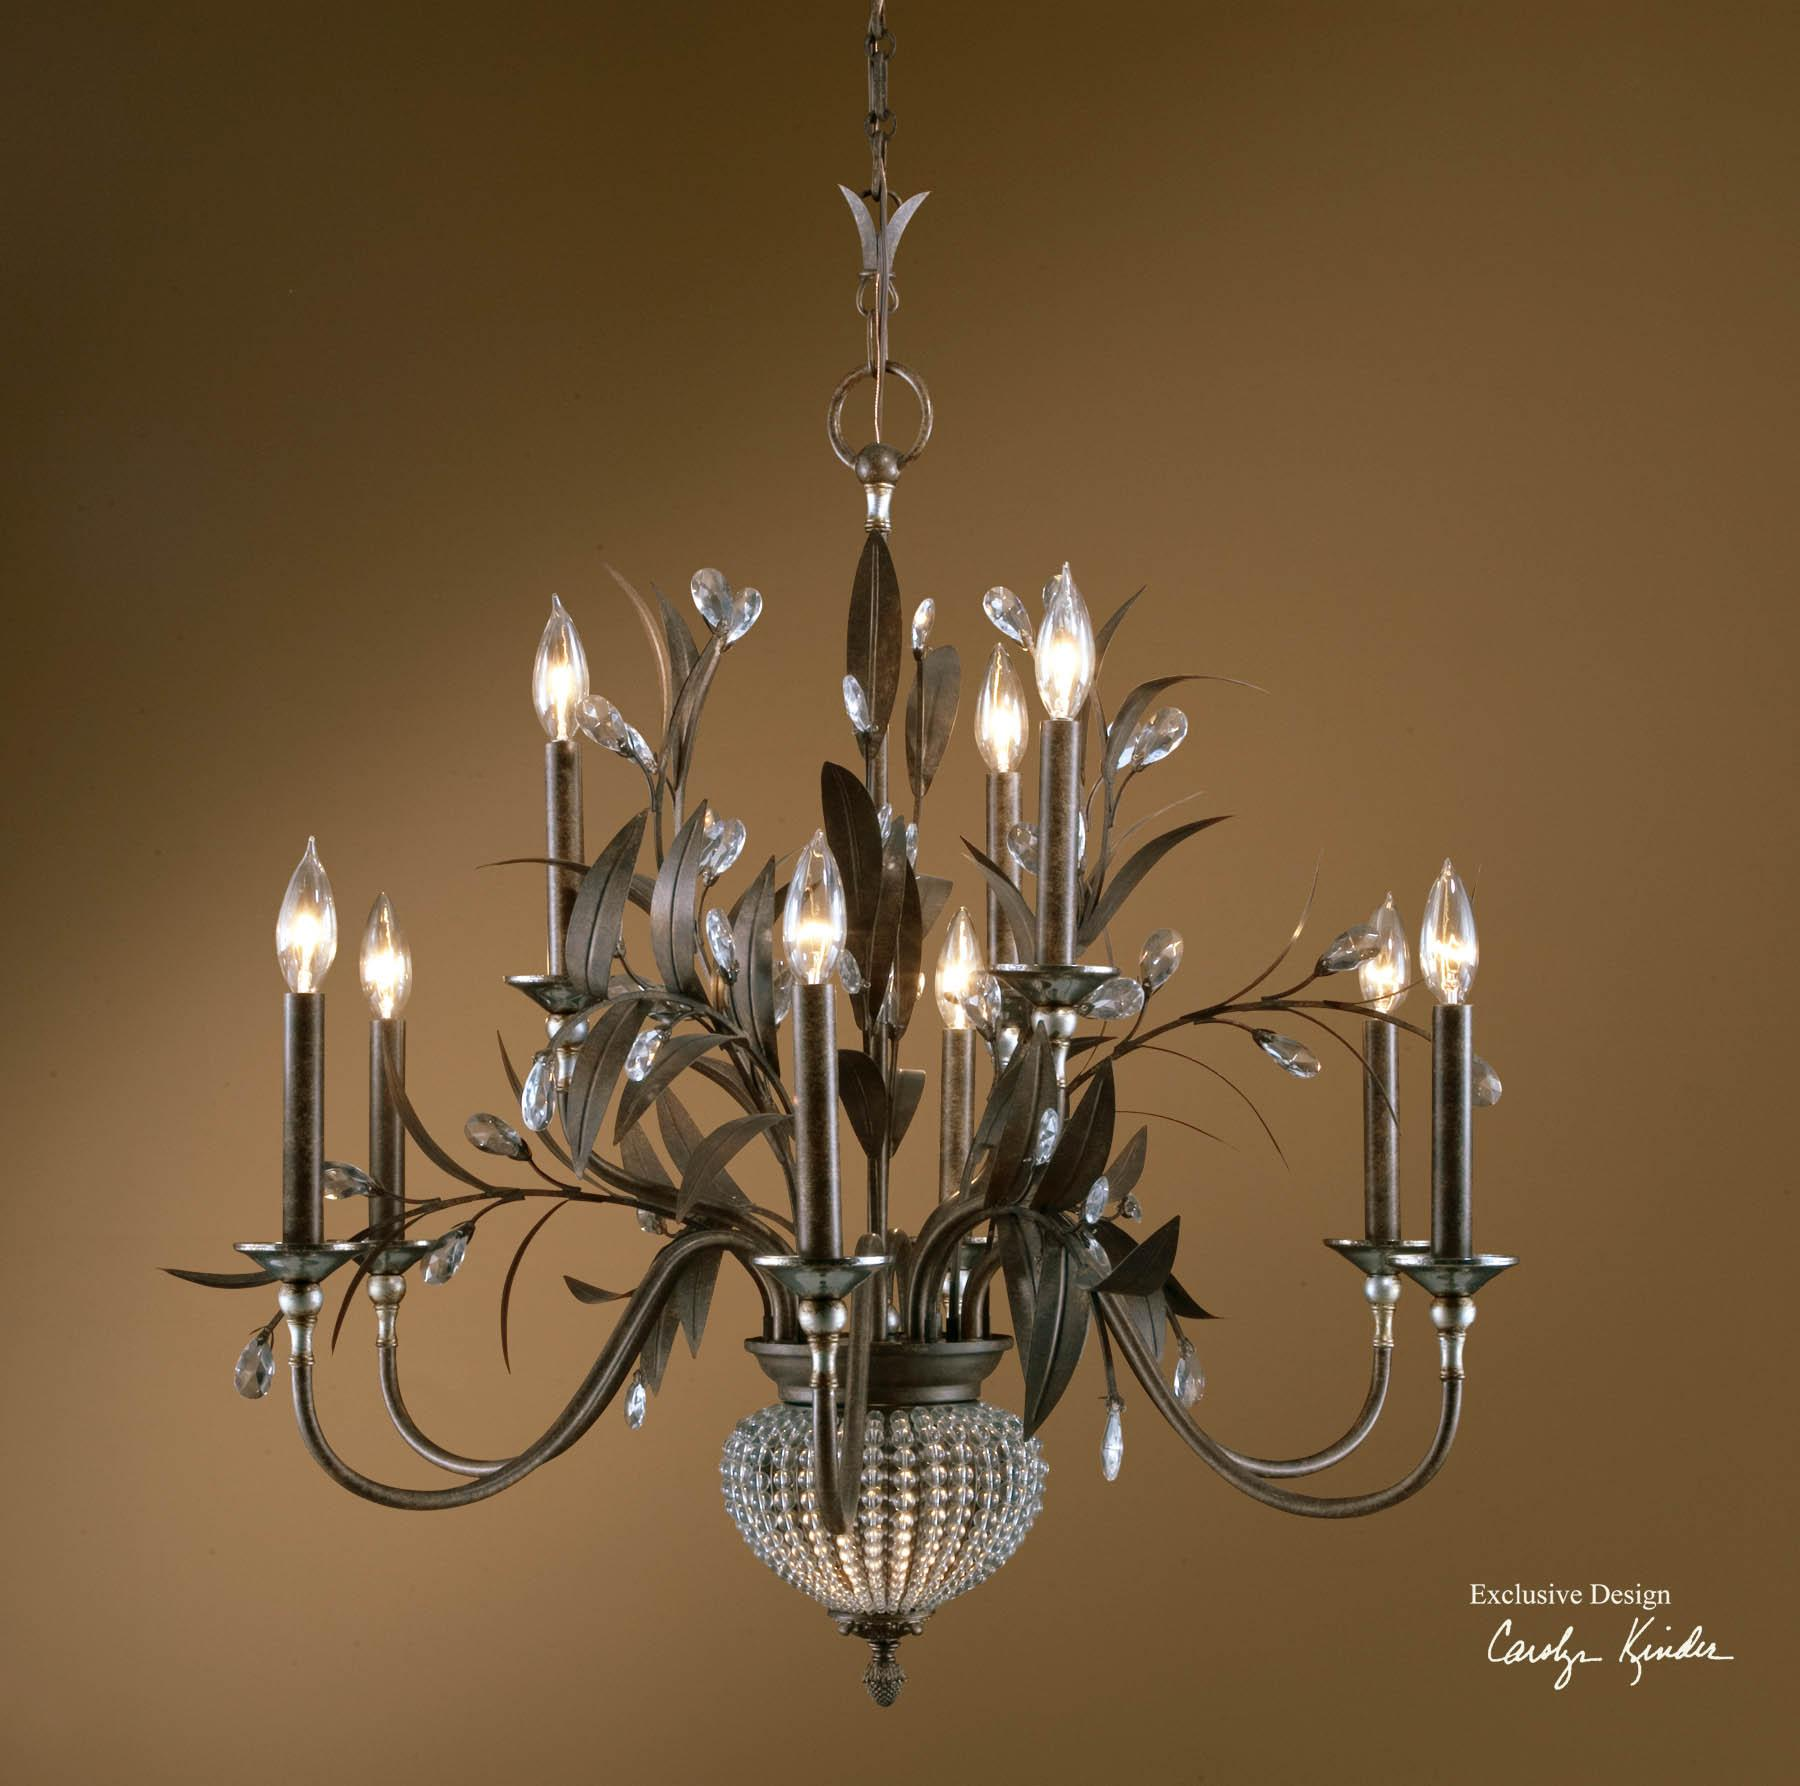 Uttermost Lighting Fixtures Cristal De Lisbon 9+2 Light Chandelier - Item Number: 21094